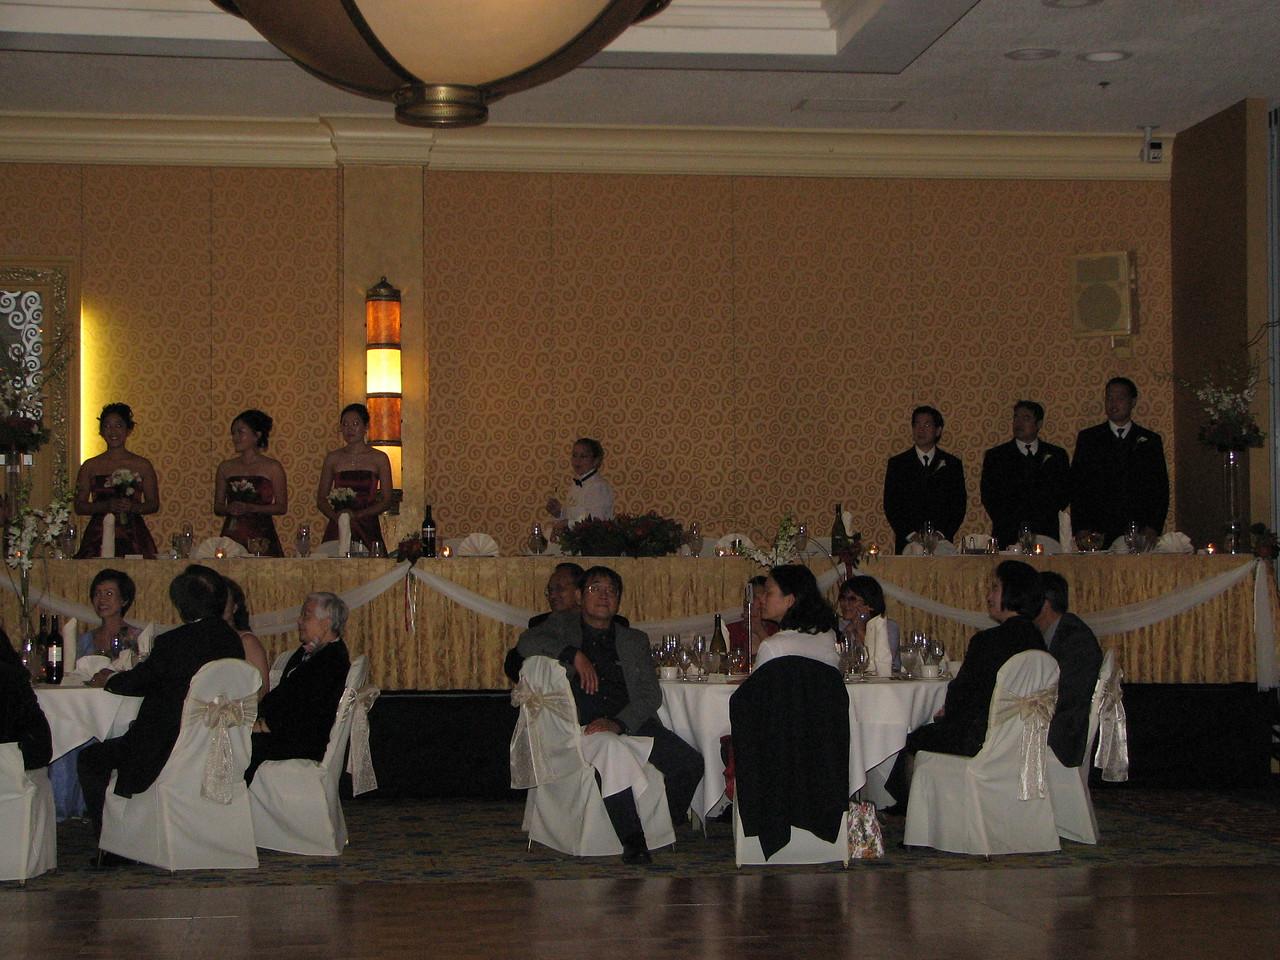 2006 10 08 Sun - Reception - Wedding party @ head table